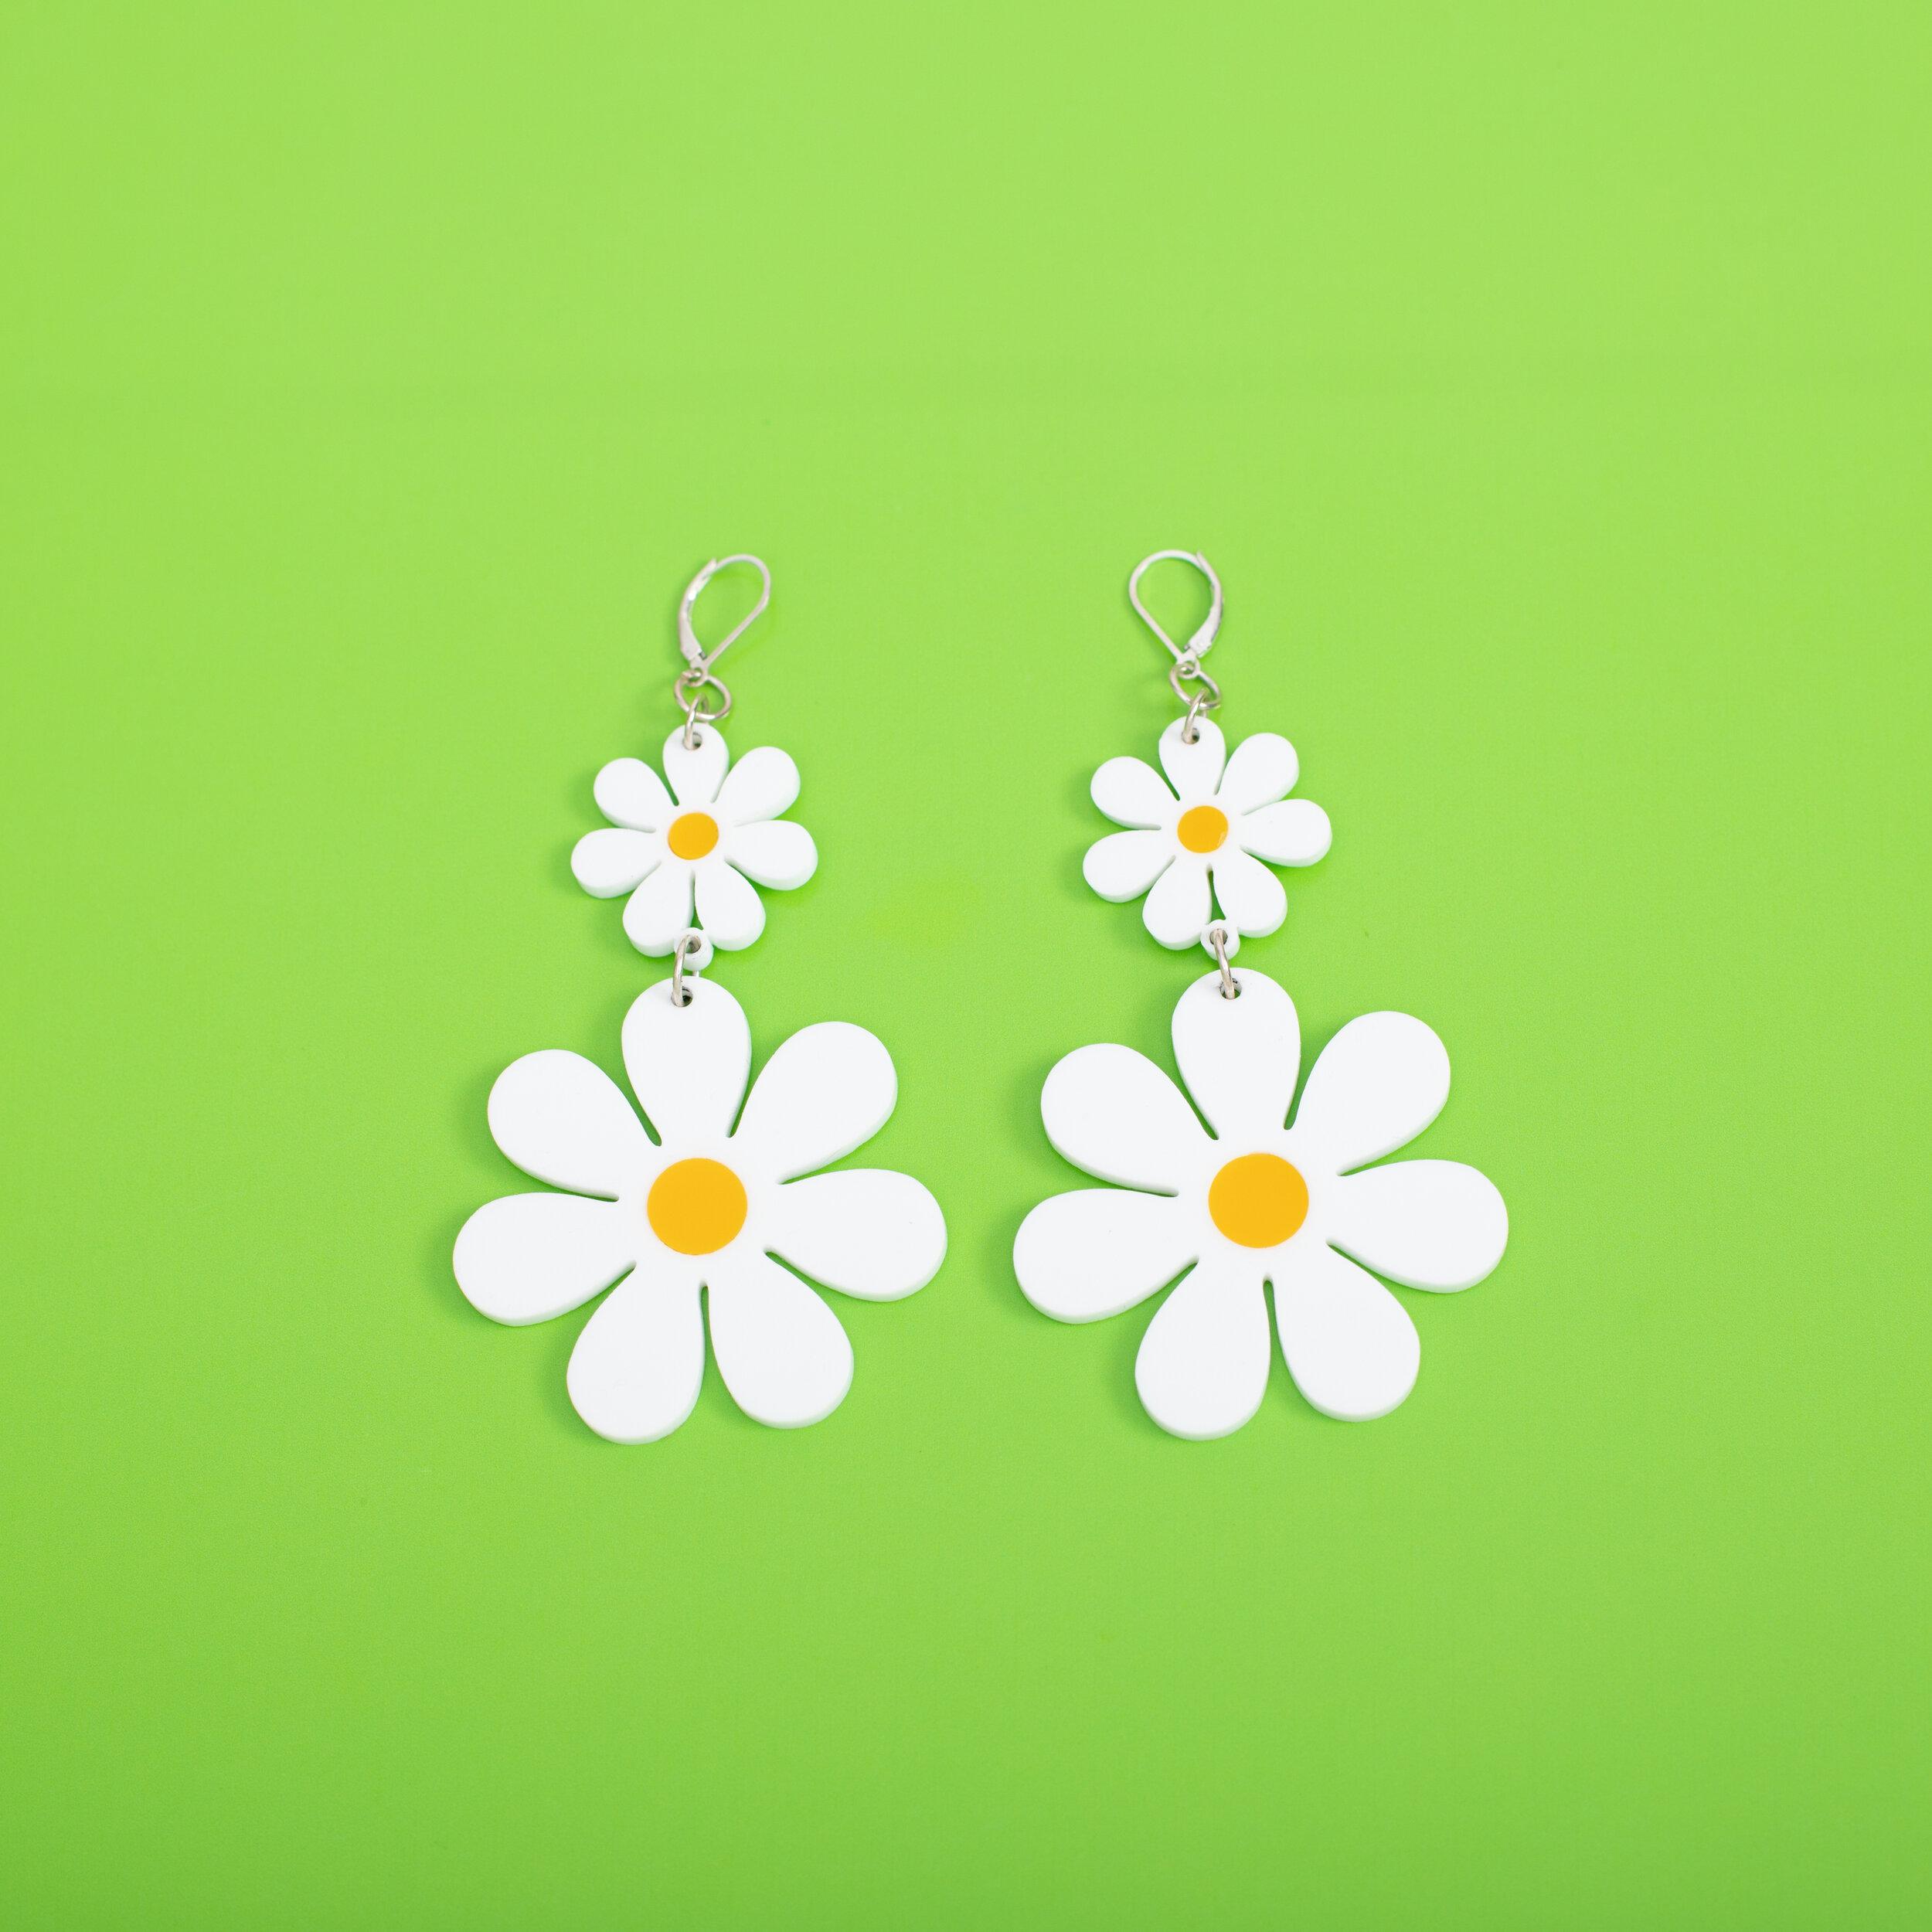 MindFlowers_Double_Daisy_Yellow_White_Dangle_Earrings.jpg